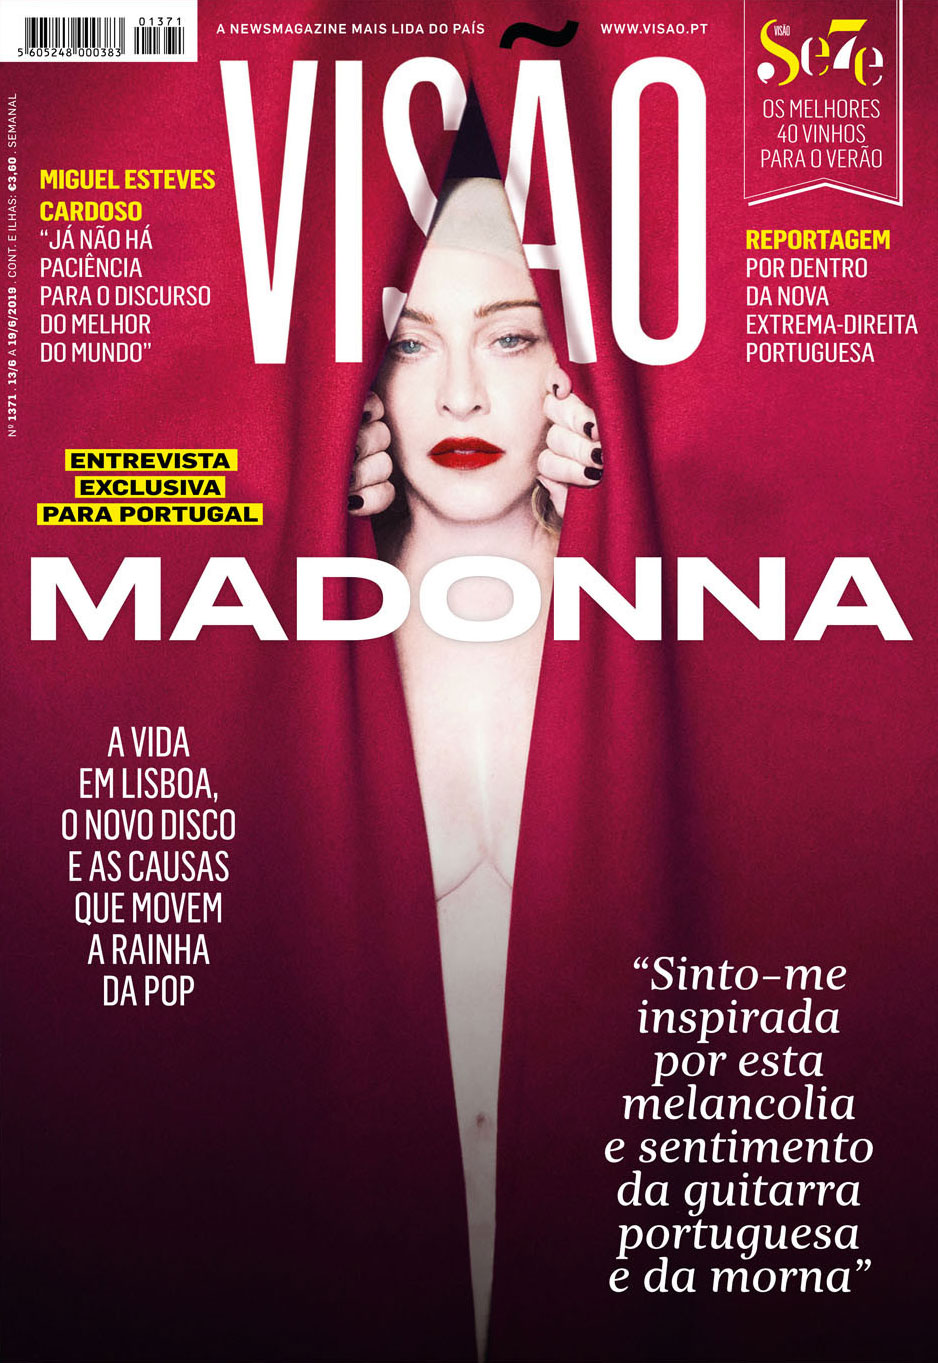 madonna magazine portoghese visao